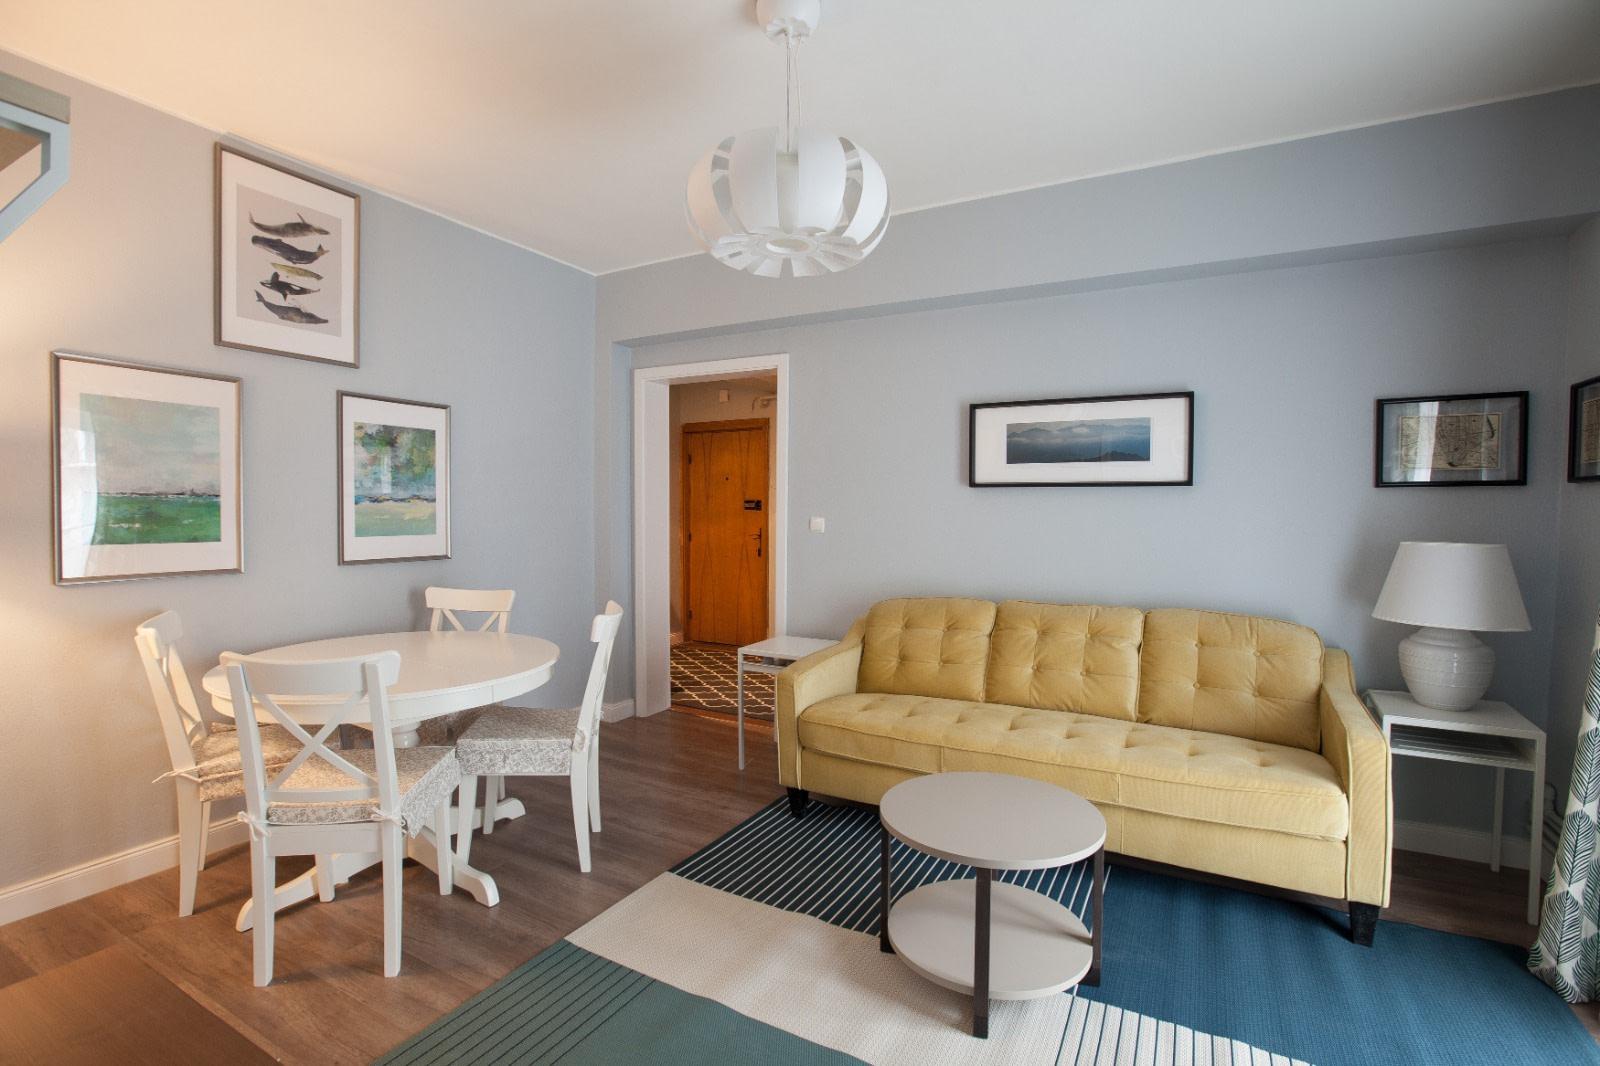 2 Camere | Cismigiu | Centrala | Balcon | Brezoianu